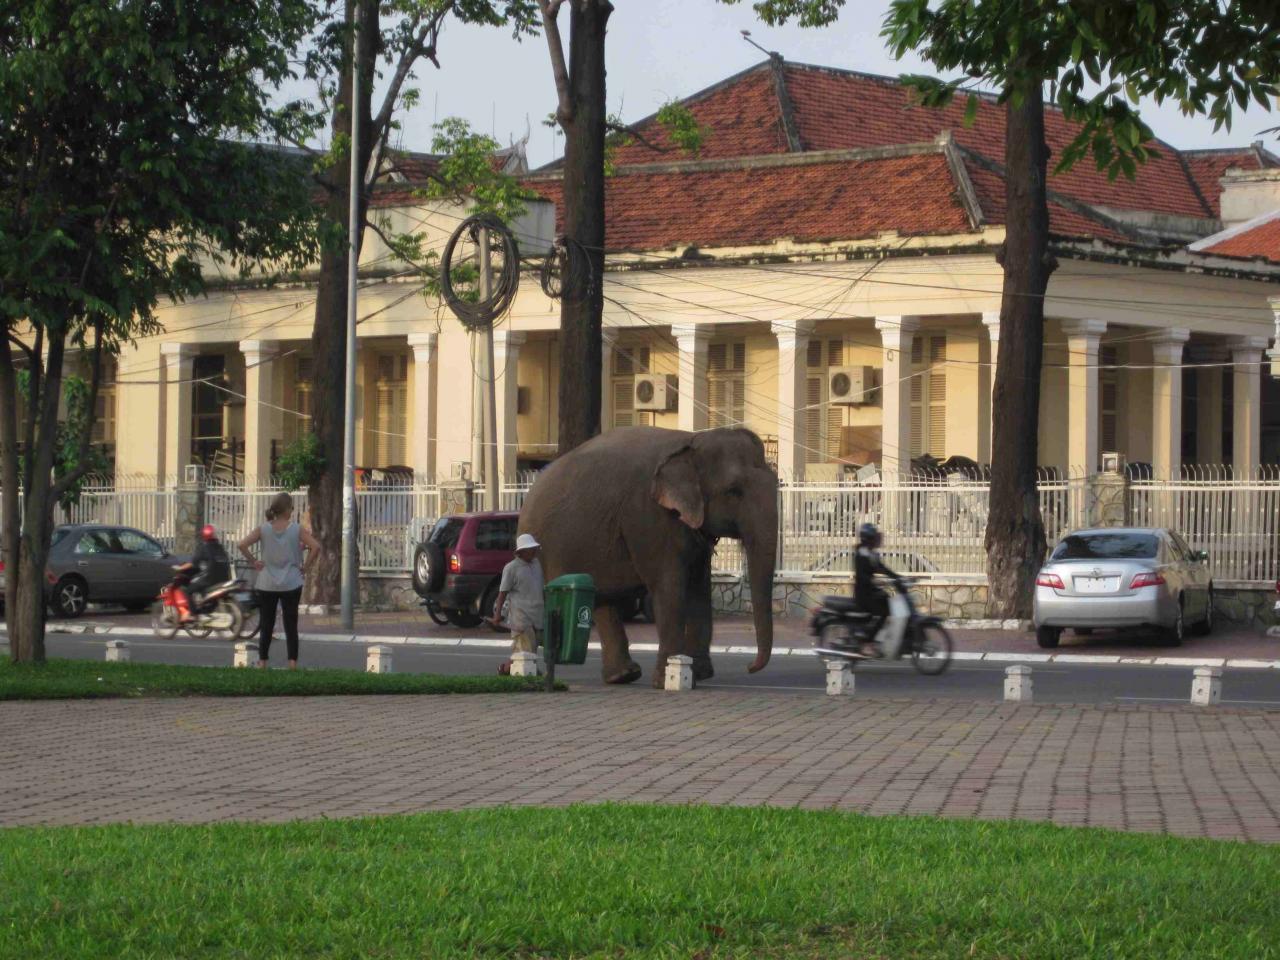 Elephant Phnom Penh